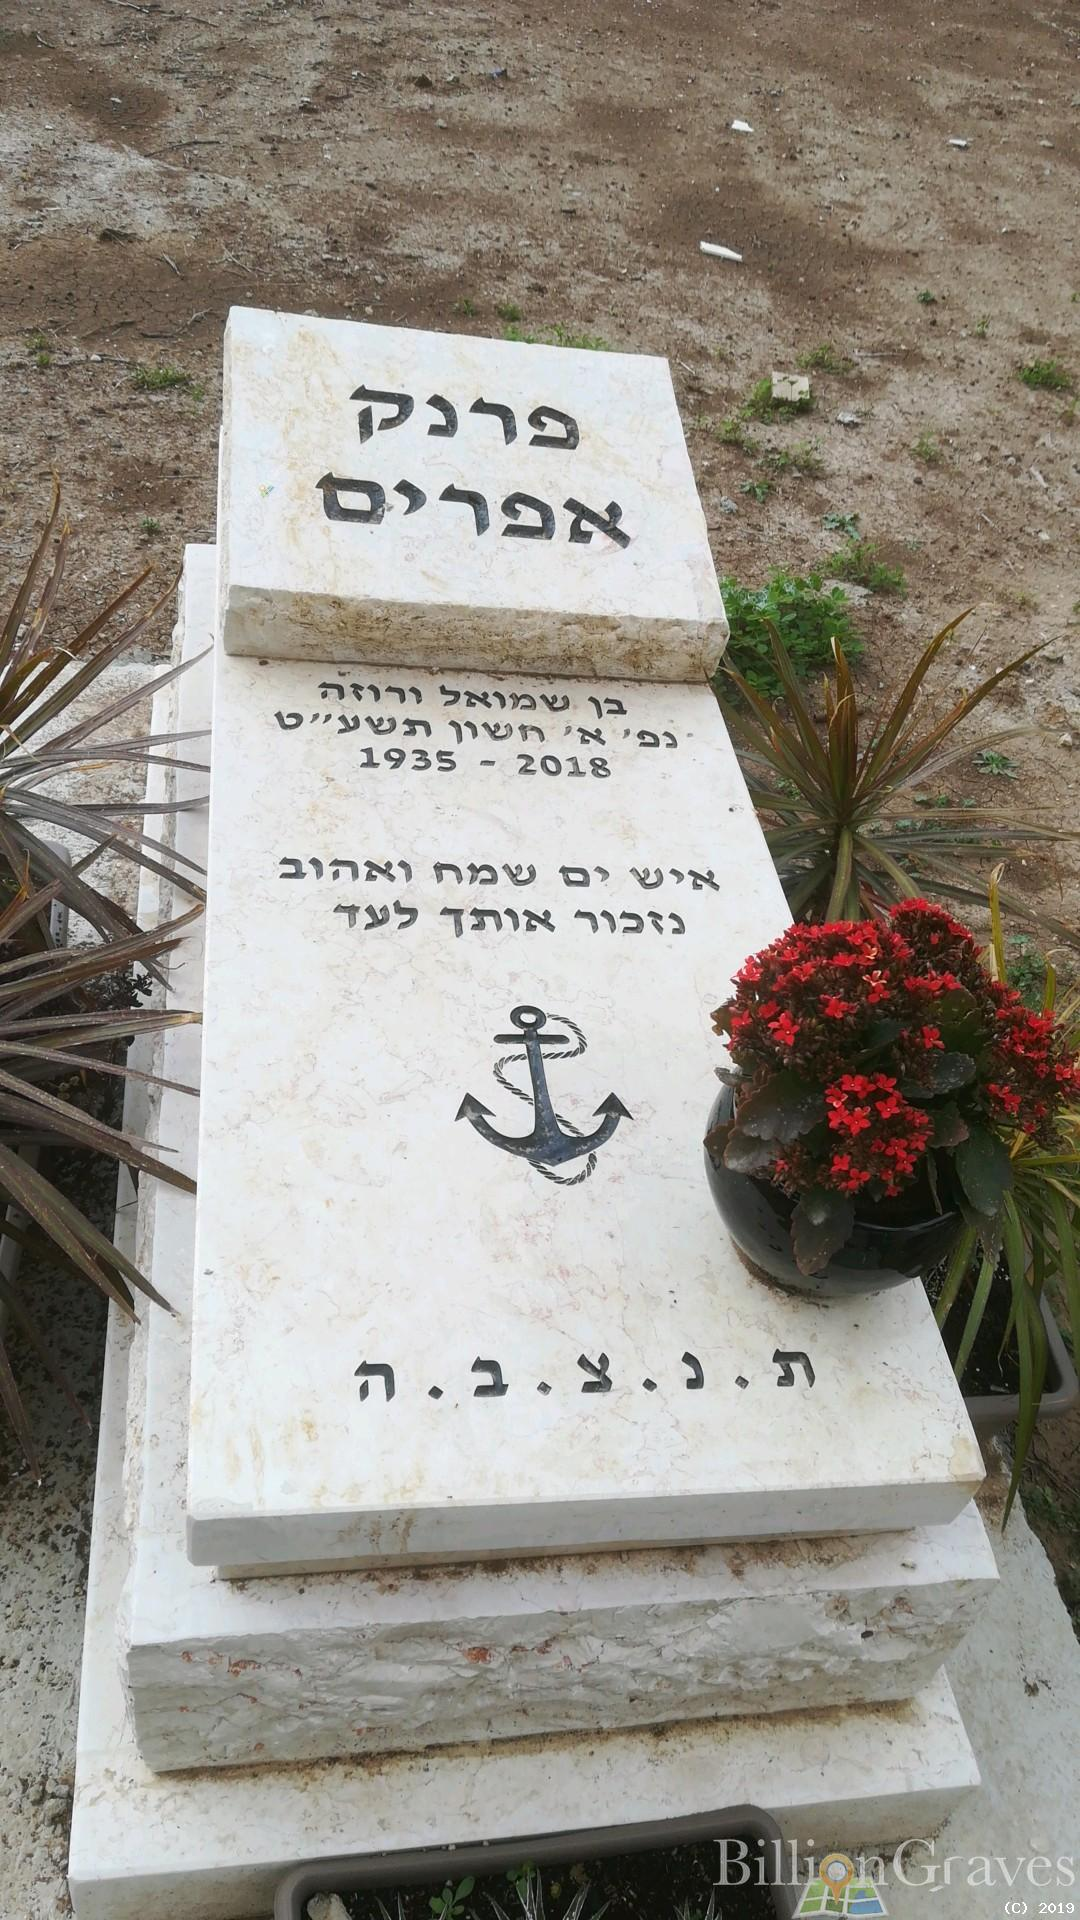 anchor, gravestone Jew, BillionGraves, Jewish, genealogy, family history, GPS, BillionGraves app, Israel, Jew, Hebrew, cemetery, grave, gravestone